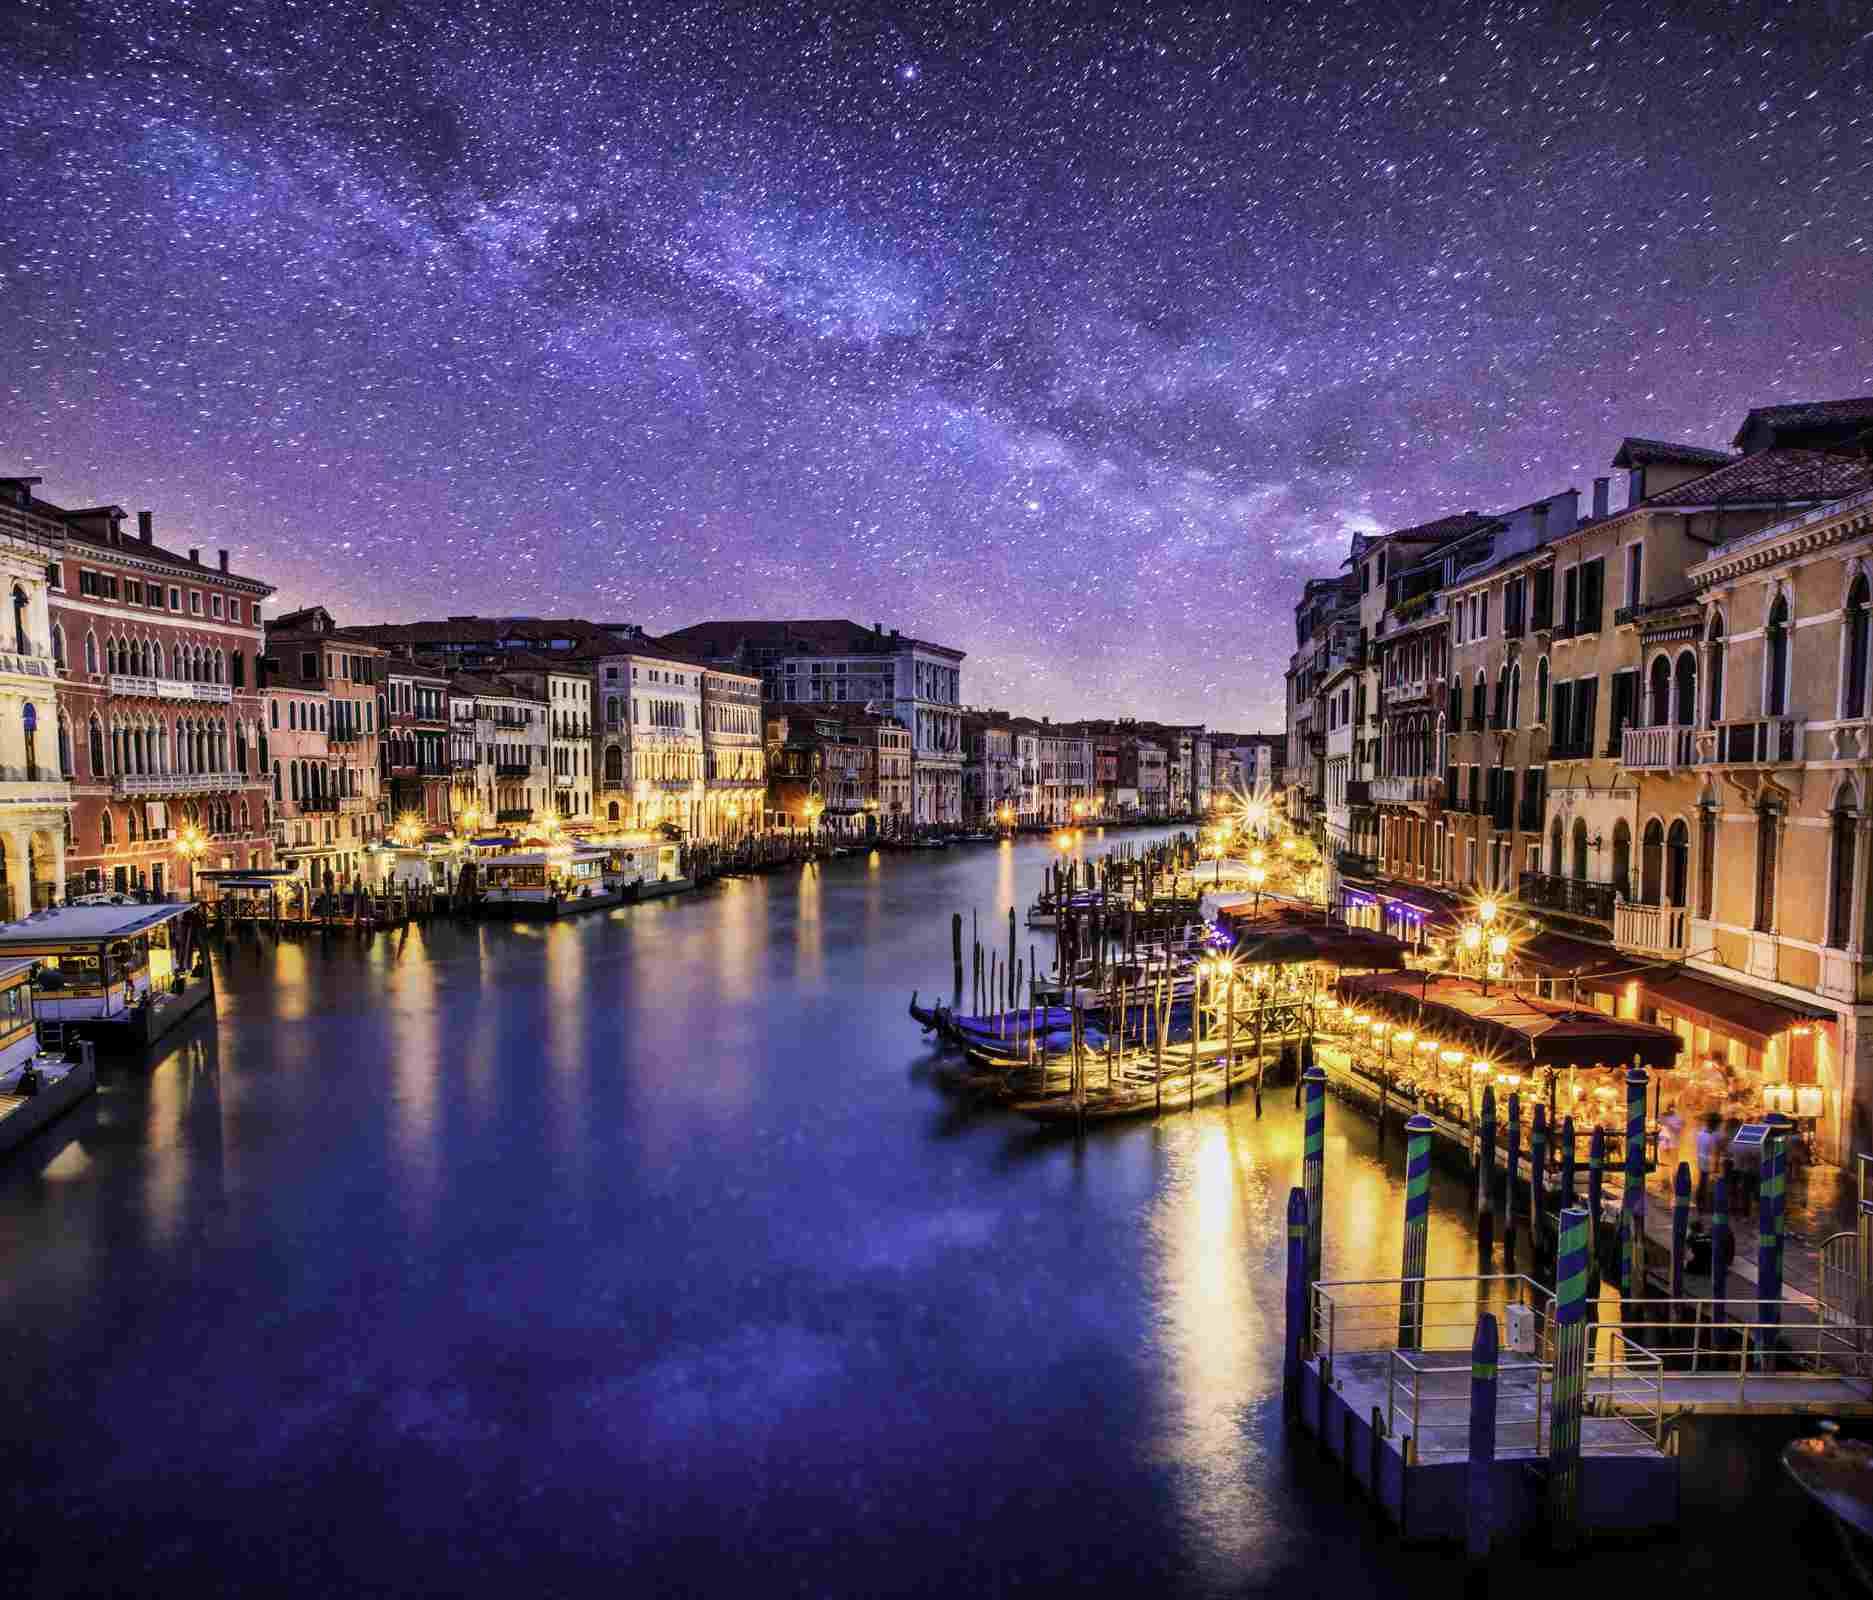 Gondola Ride and Dinner in Venice